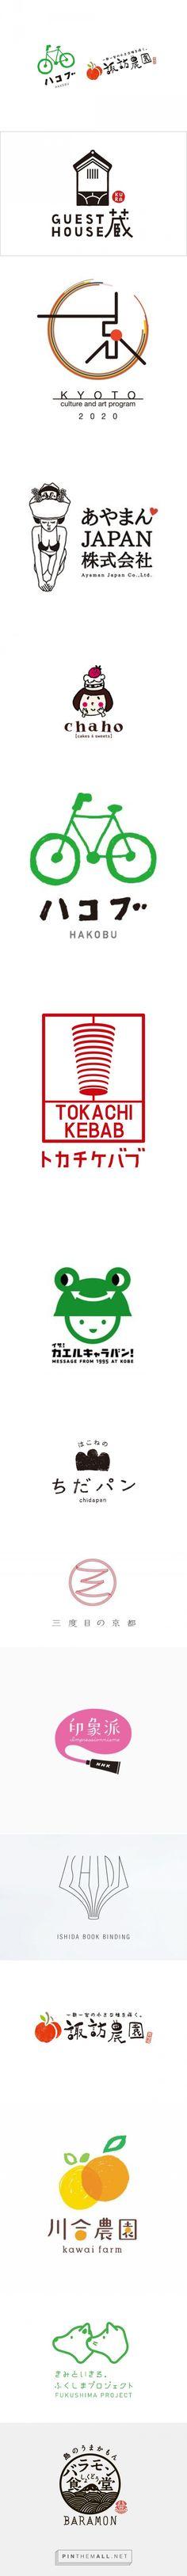 Quirky Japanese Logos   Abduzeedo Design Inspiration - created via https://pinthemall.net